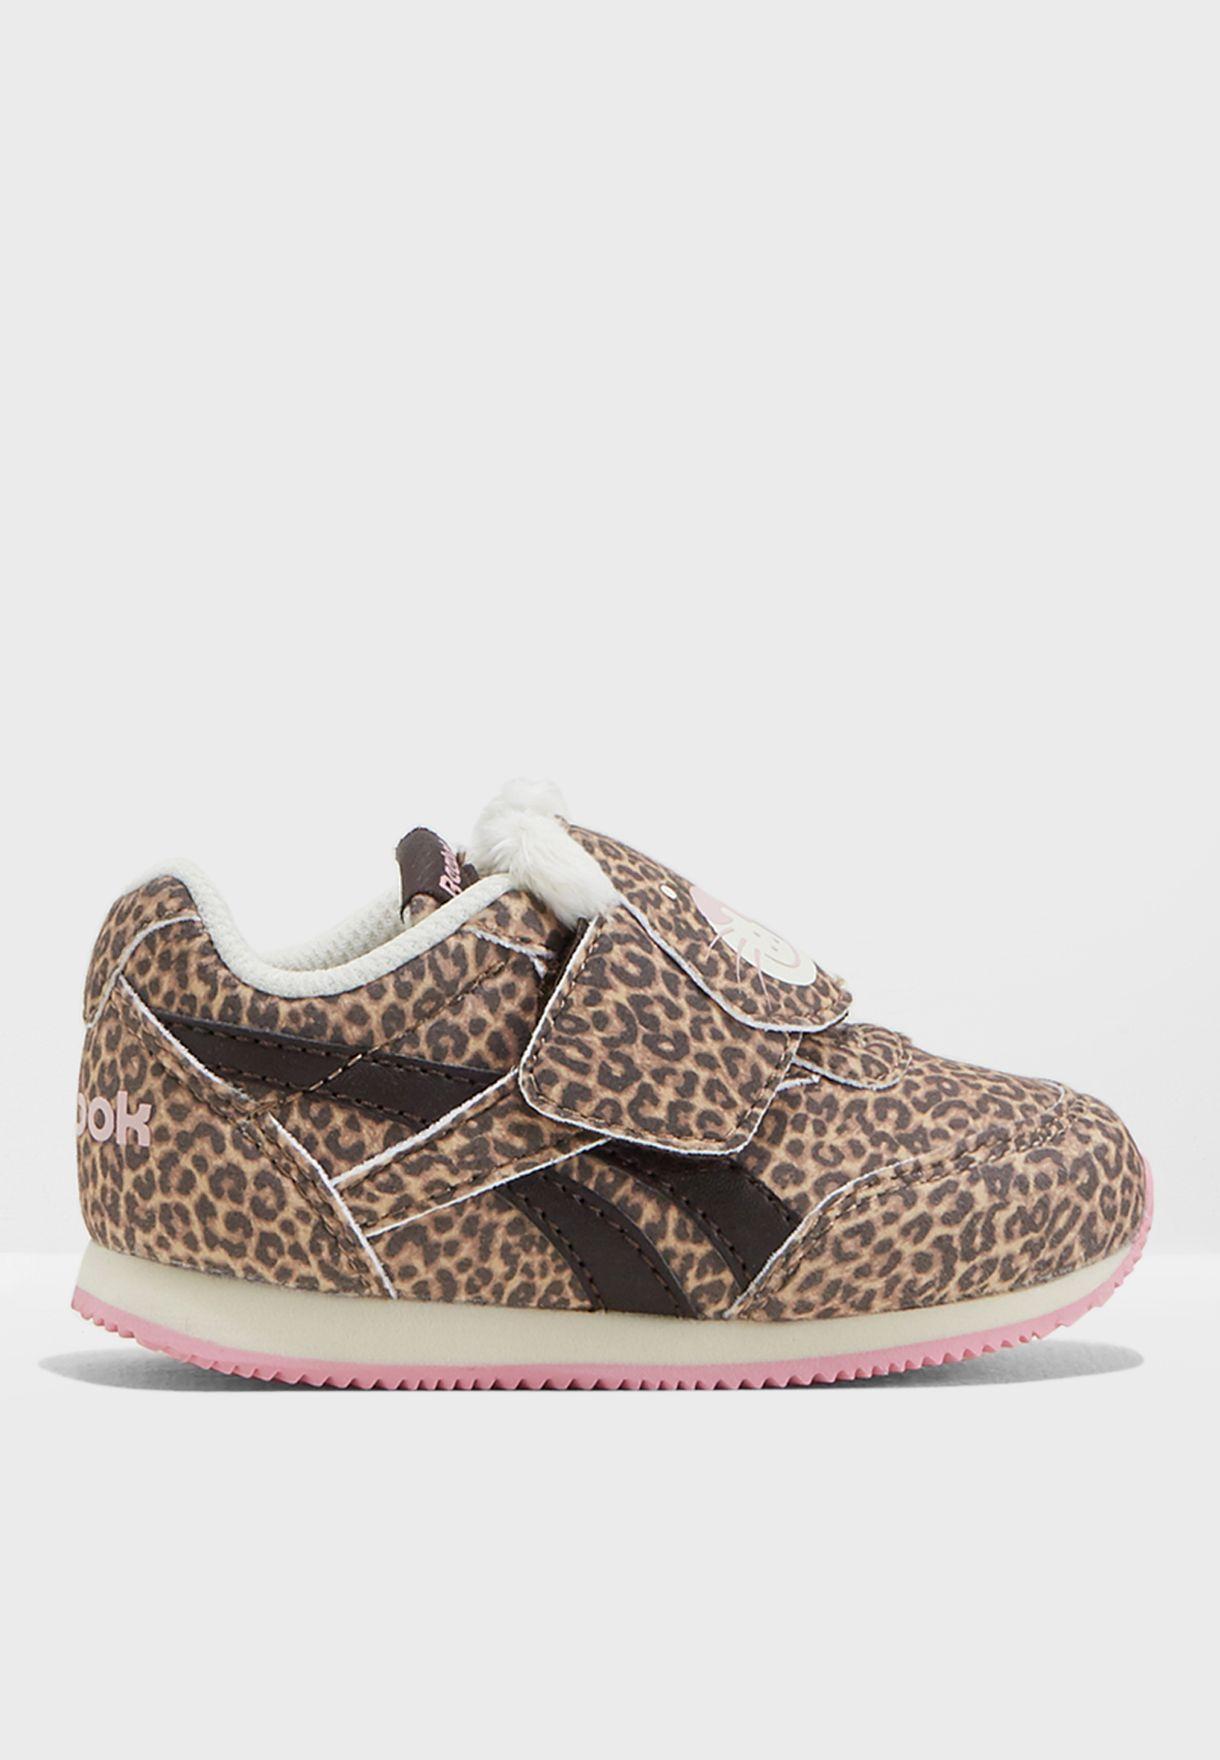 becedb465e9 Shop Reebok animalprint Infant Royal Classic Jogger 2 KC CN5036 for ...